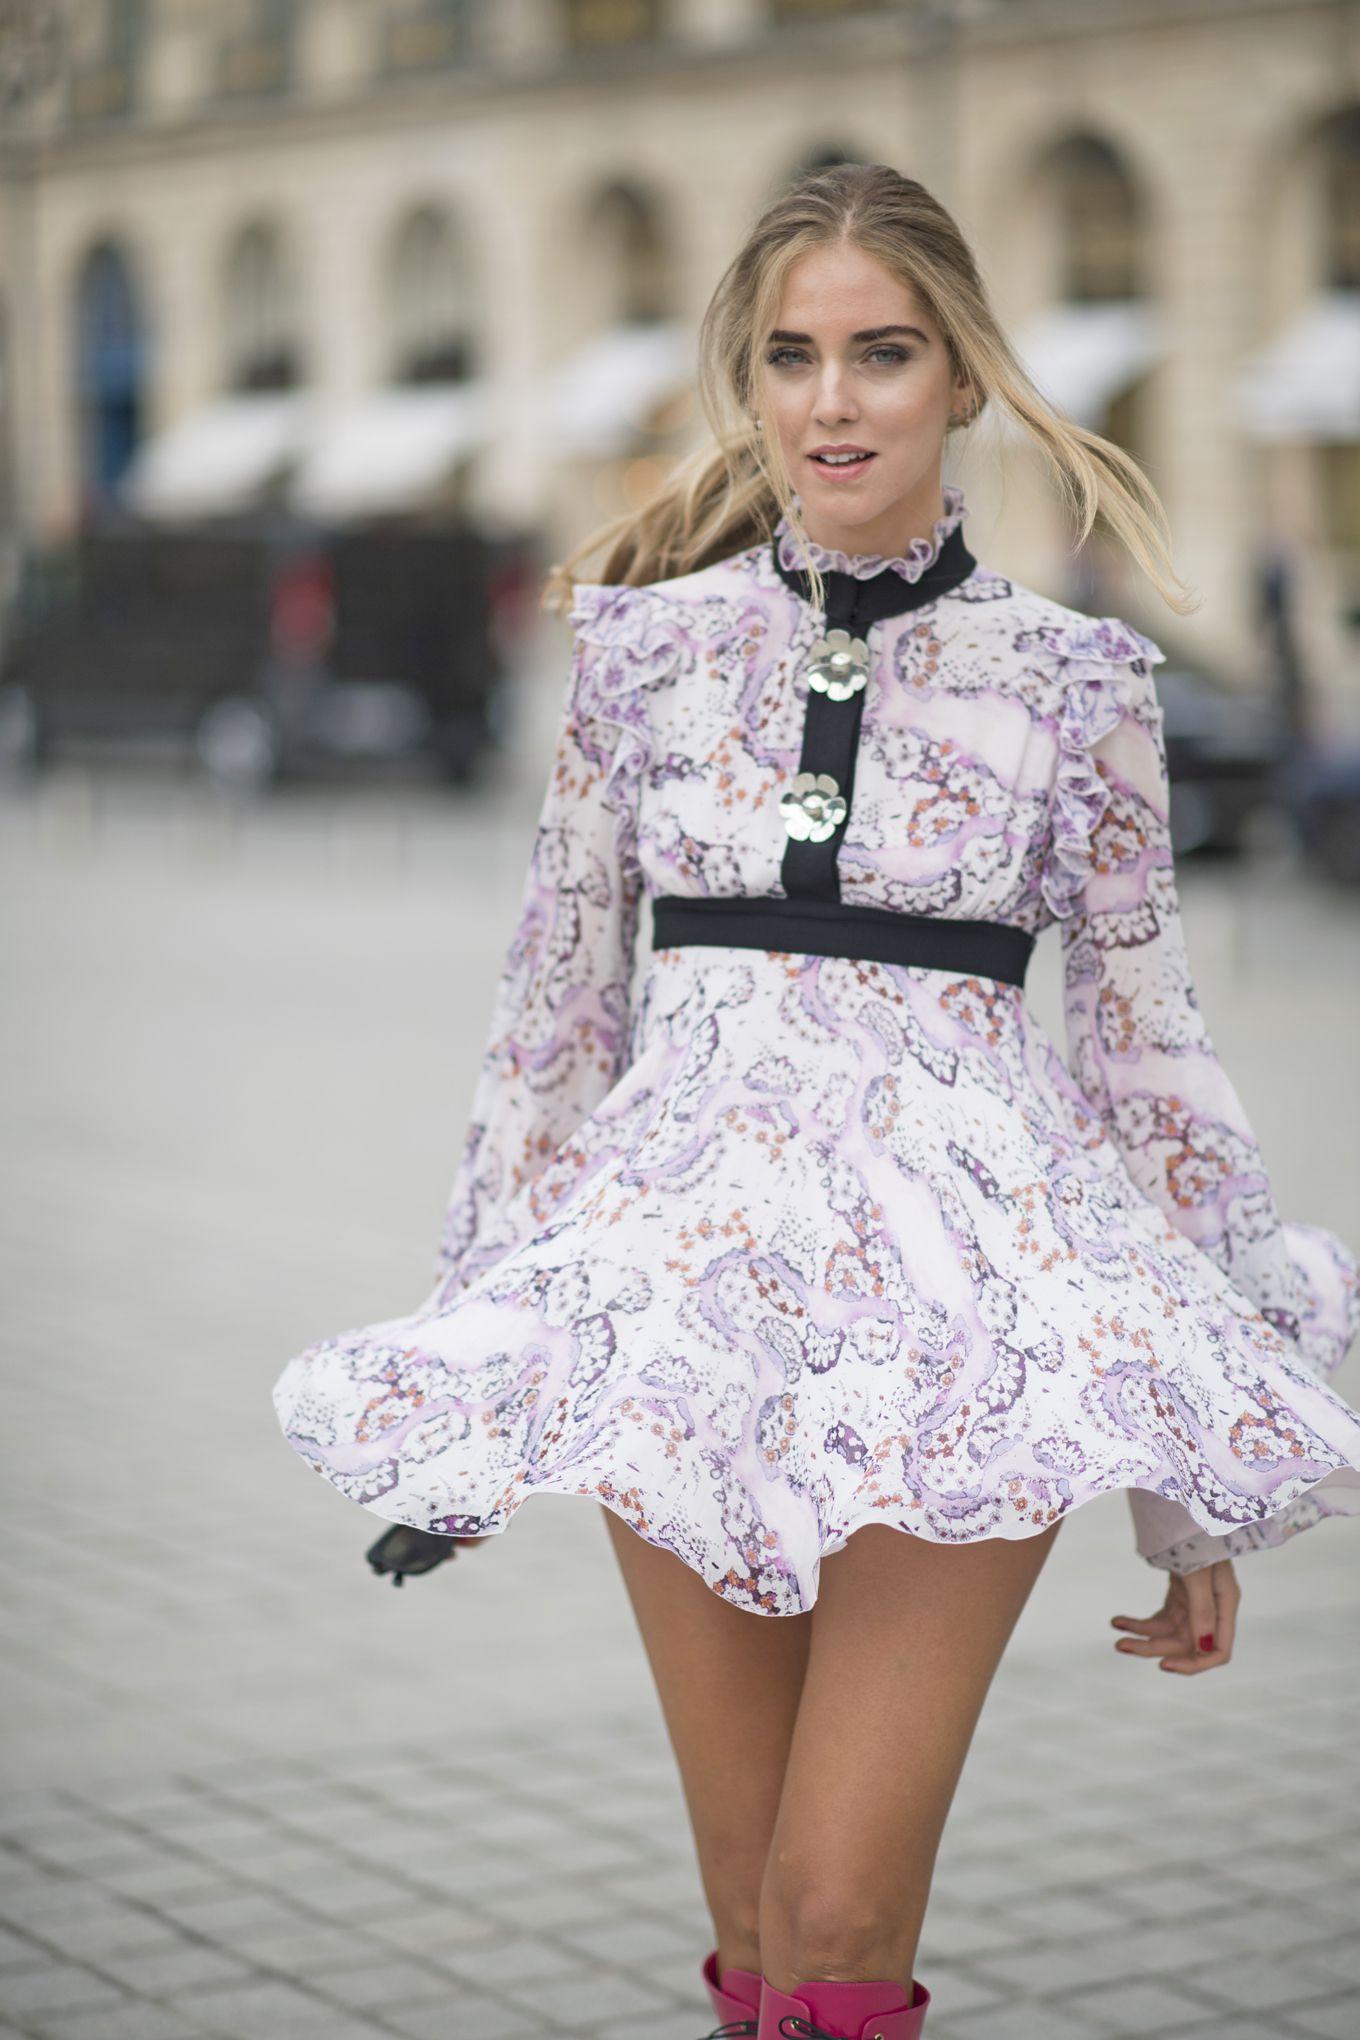 12 vestiti per i 18 anni belli e eleganti